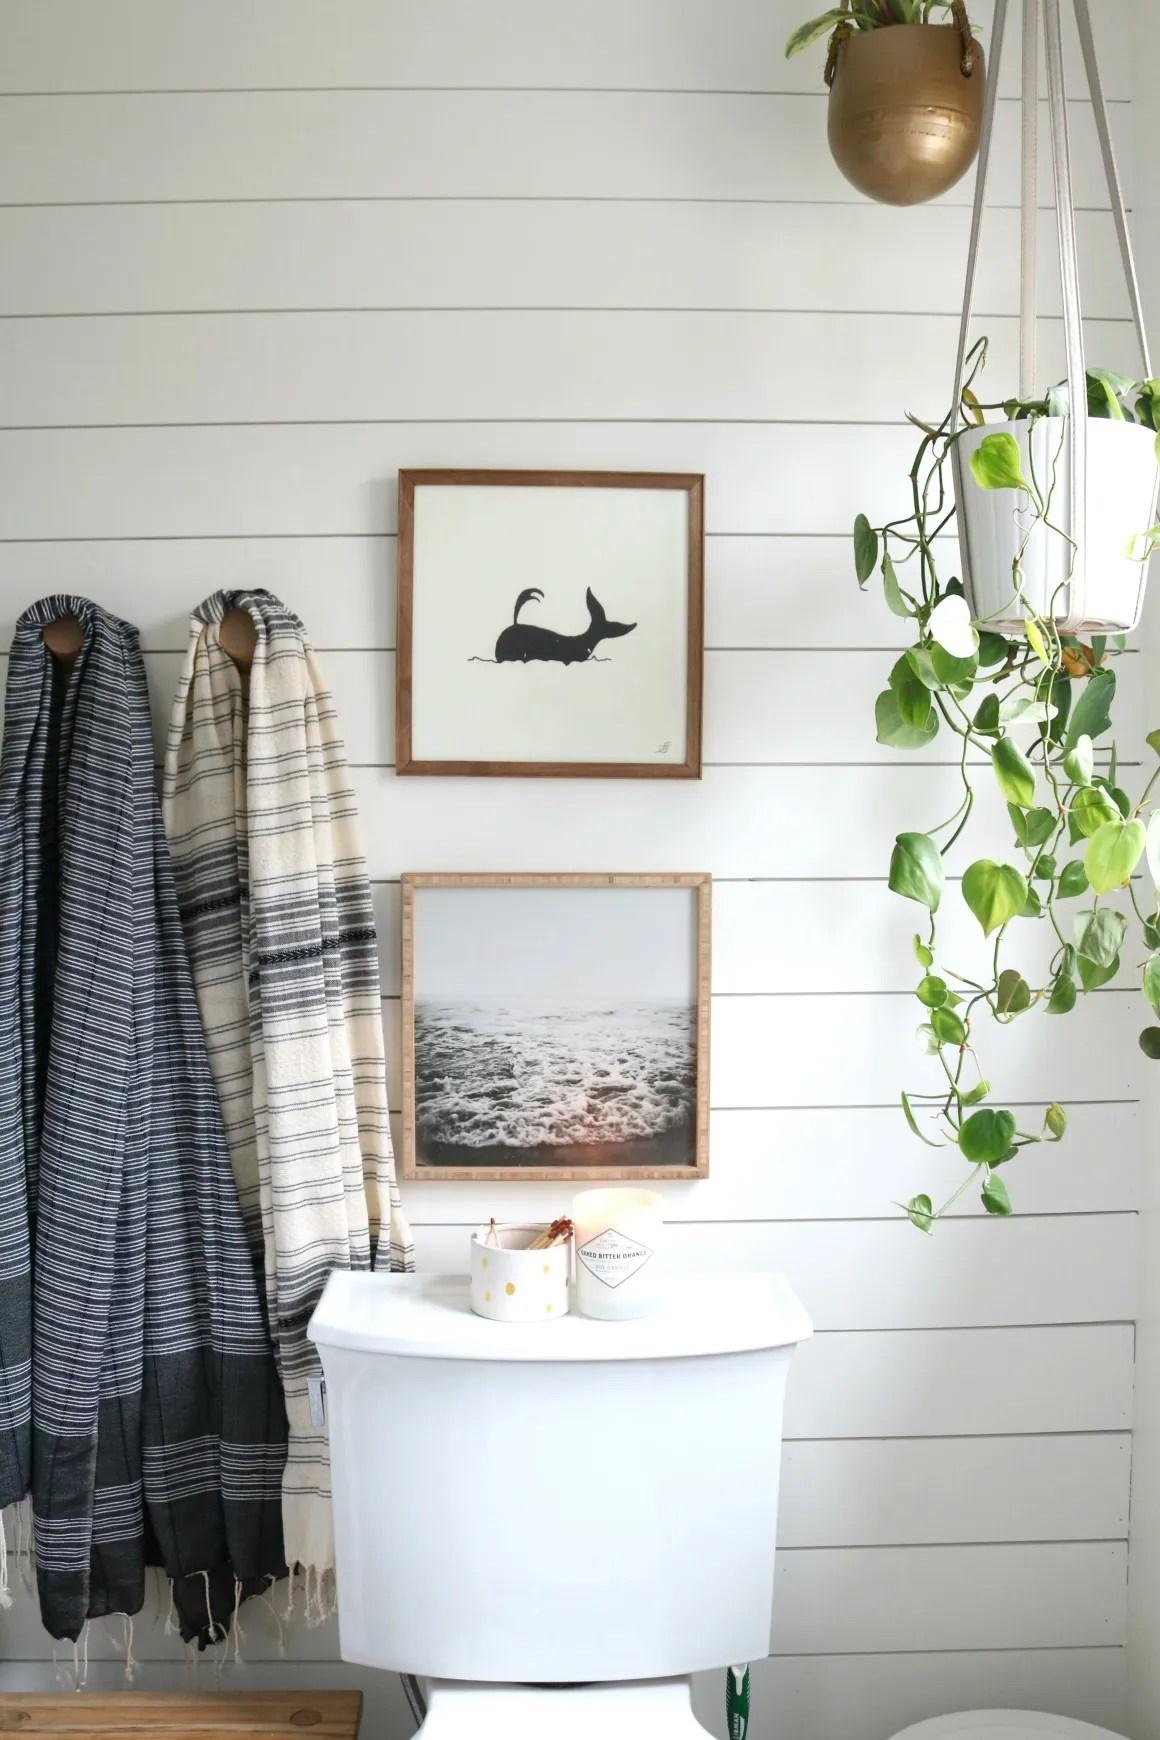 AZEK- The BEST Shiplap look in a Bathroom